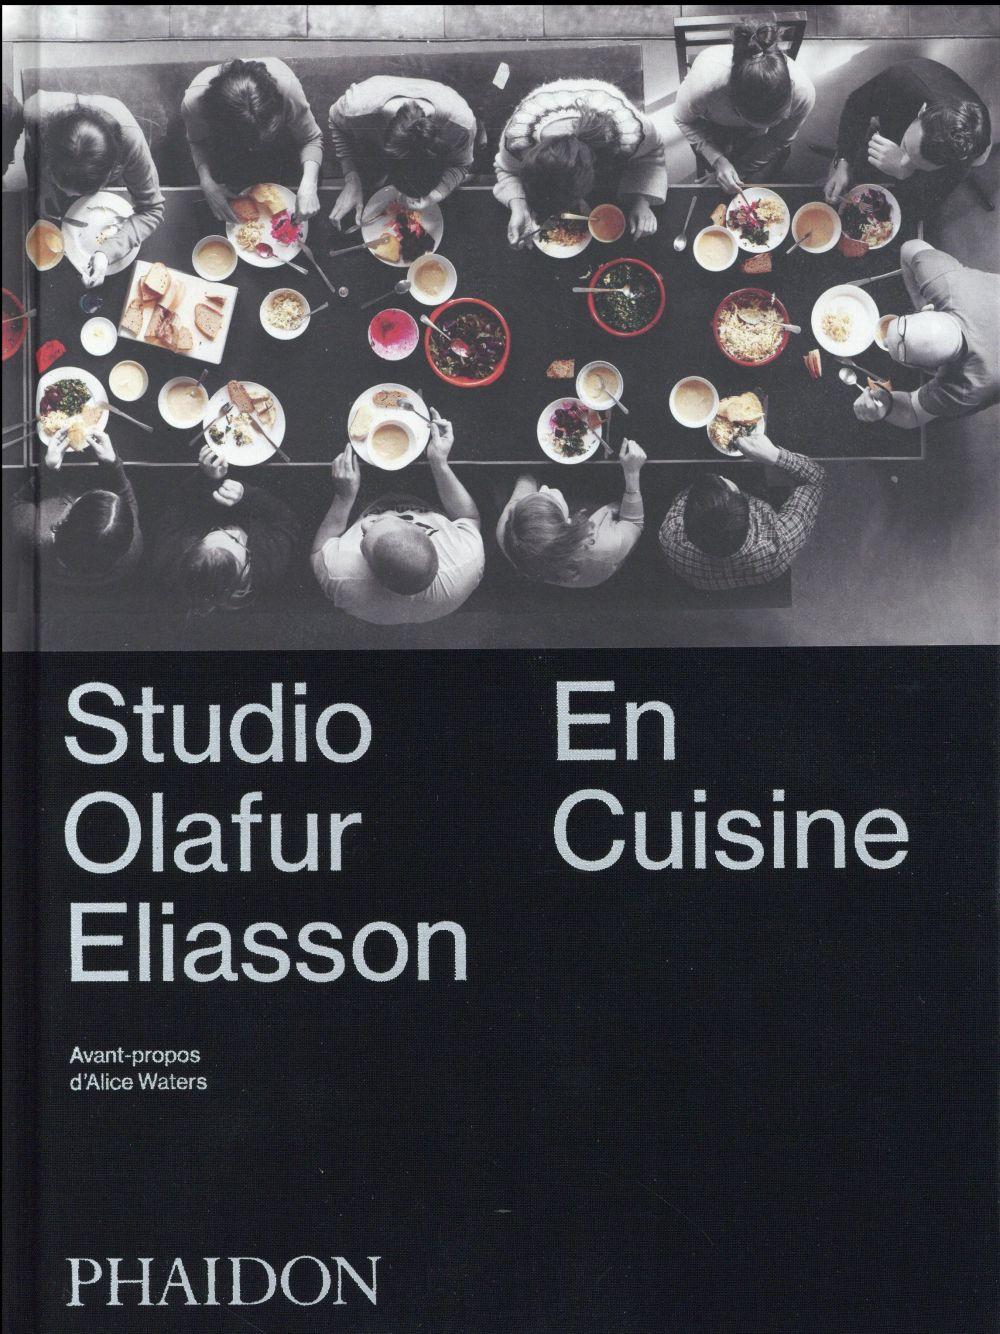 STUDIO OLAFUR ELIASSON EN CUIS ELIASSON OLAFUR Phaidon